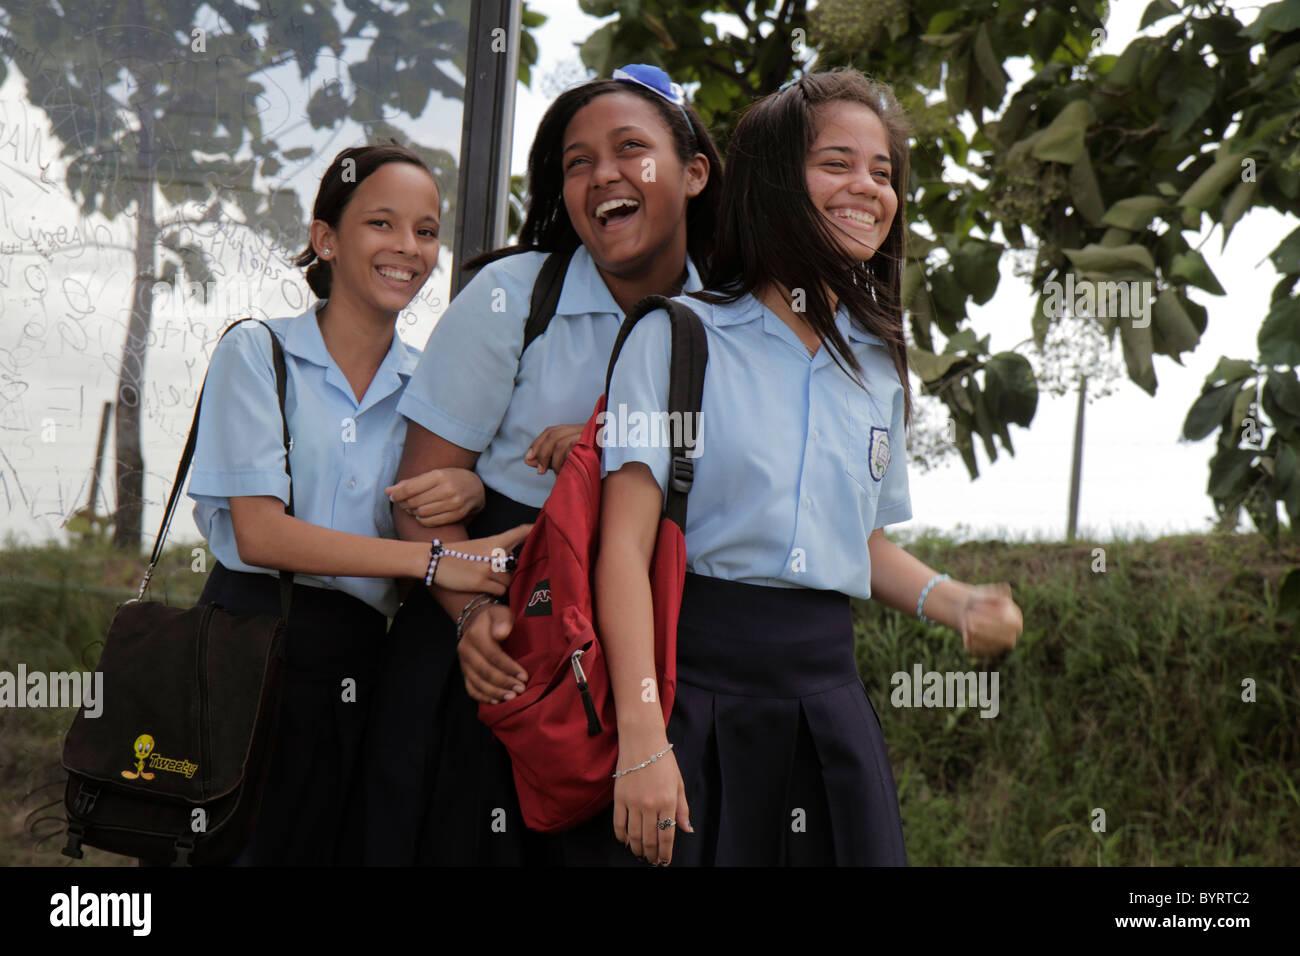 Panama Children Stock Photos & Panama Children Stock Images - Alamy